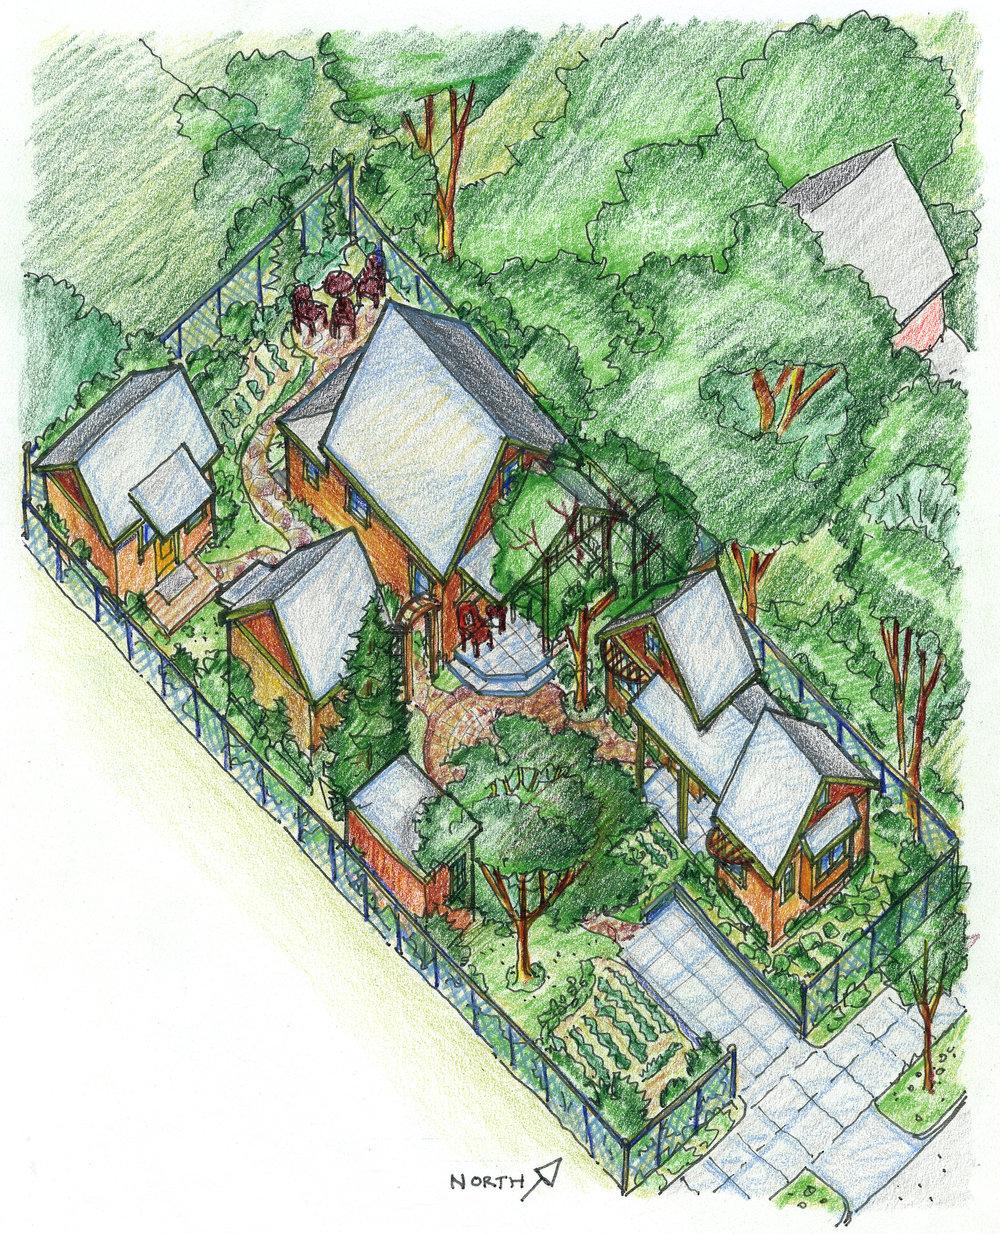 Littlest Village_Rendering.jpg